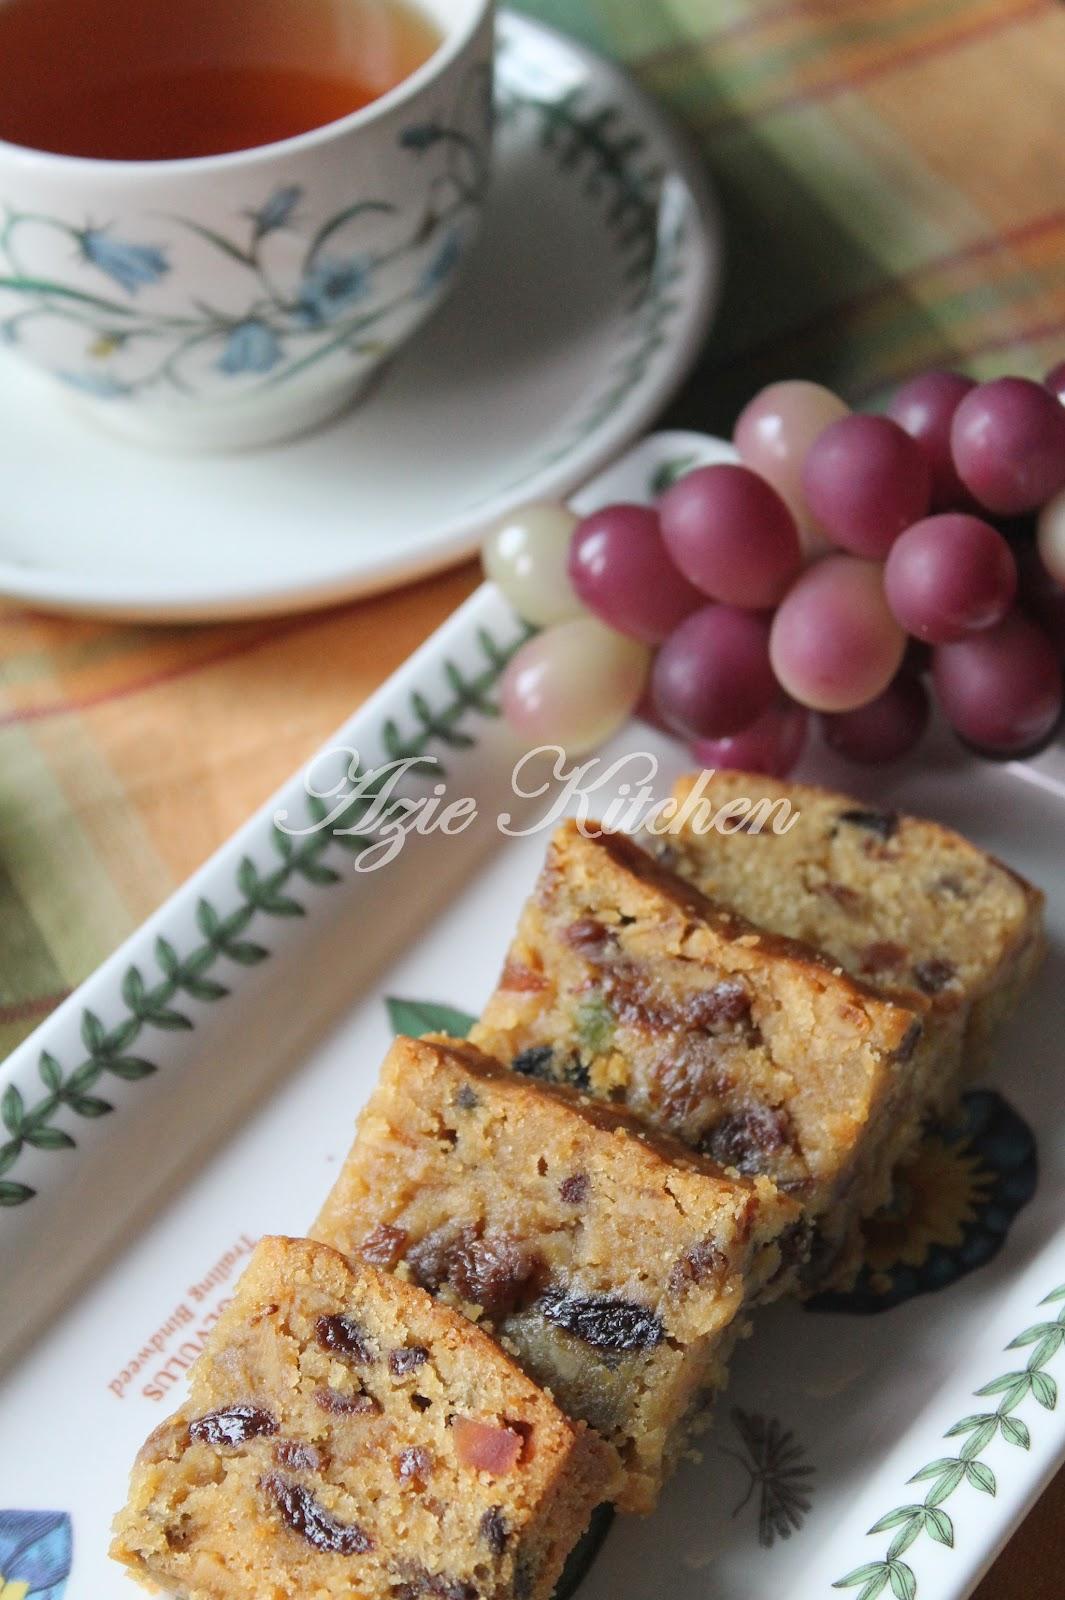 azie kitchen kek buah buahan campuran kak leen Resepi Kek Buah Pic Enak dan Mudah